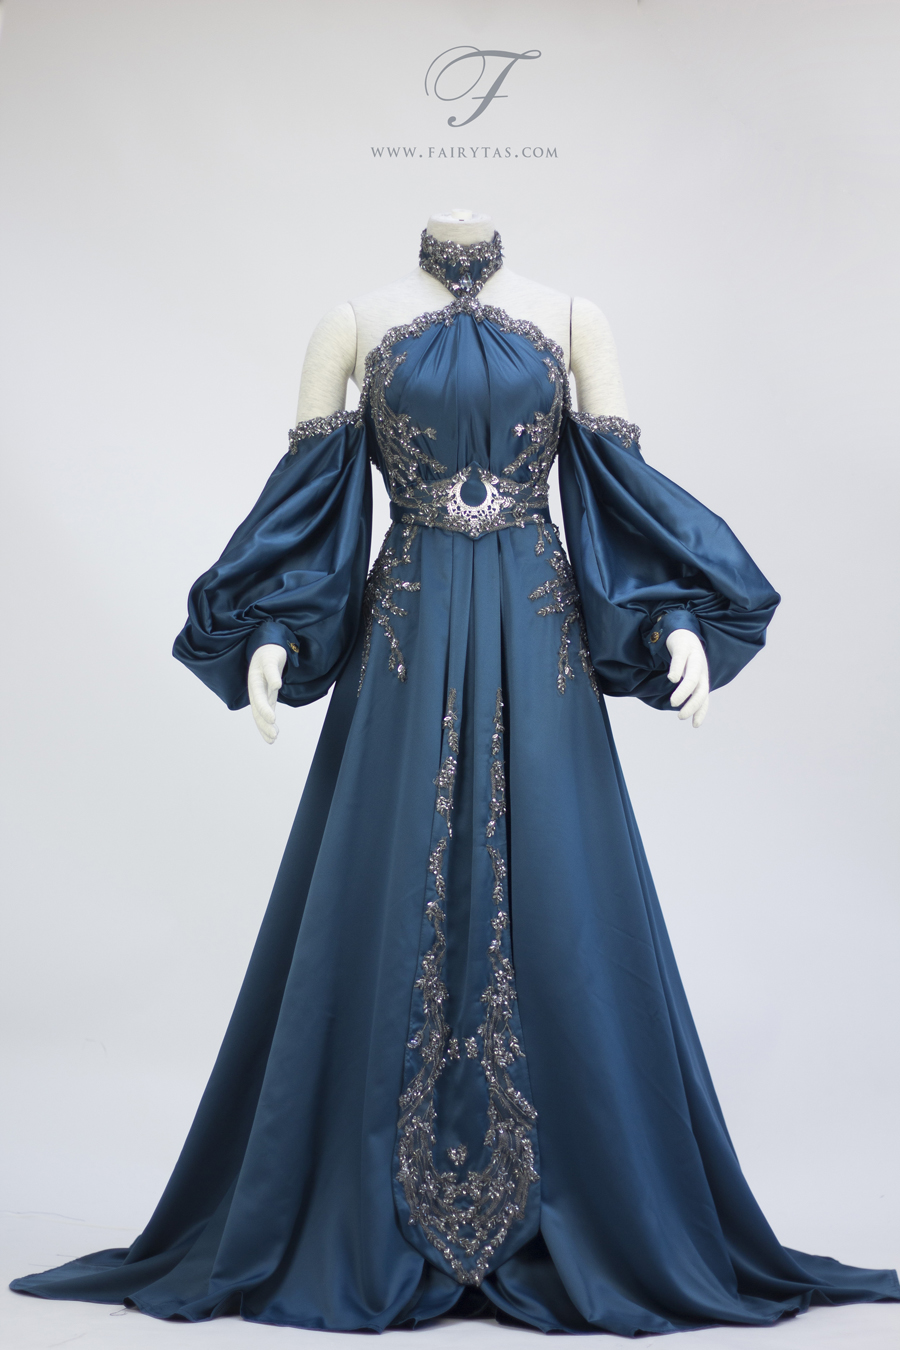 Northern Sky dress